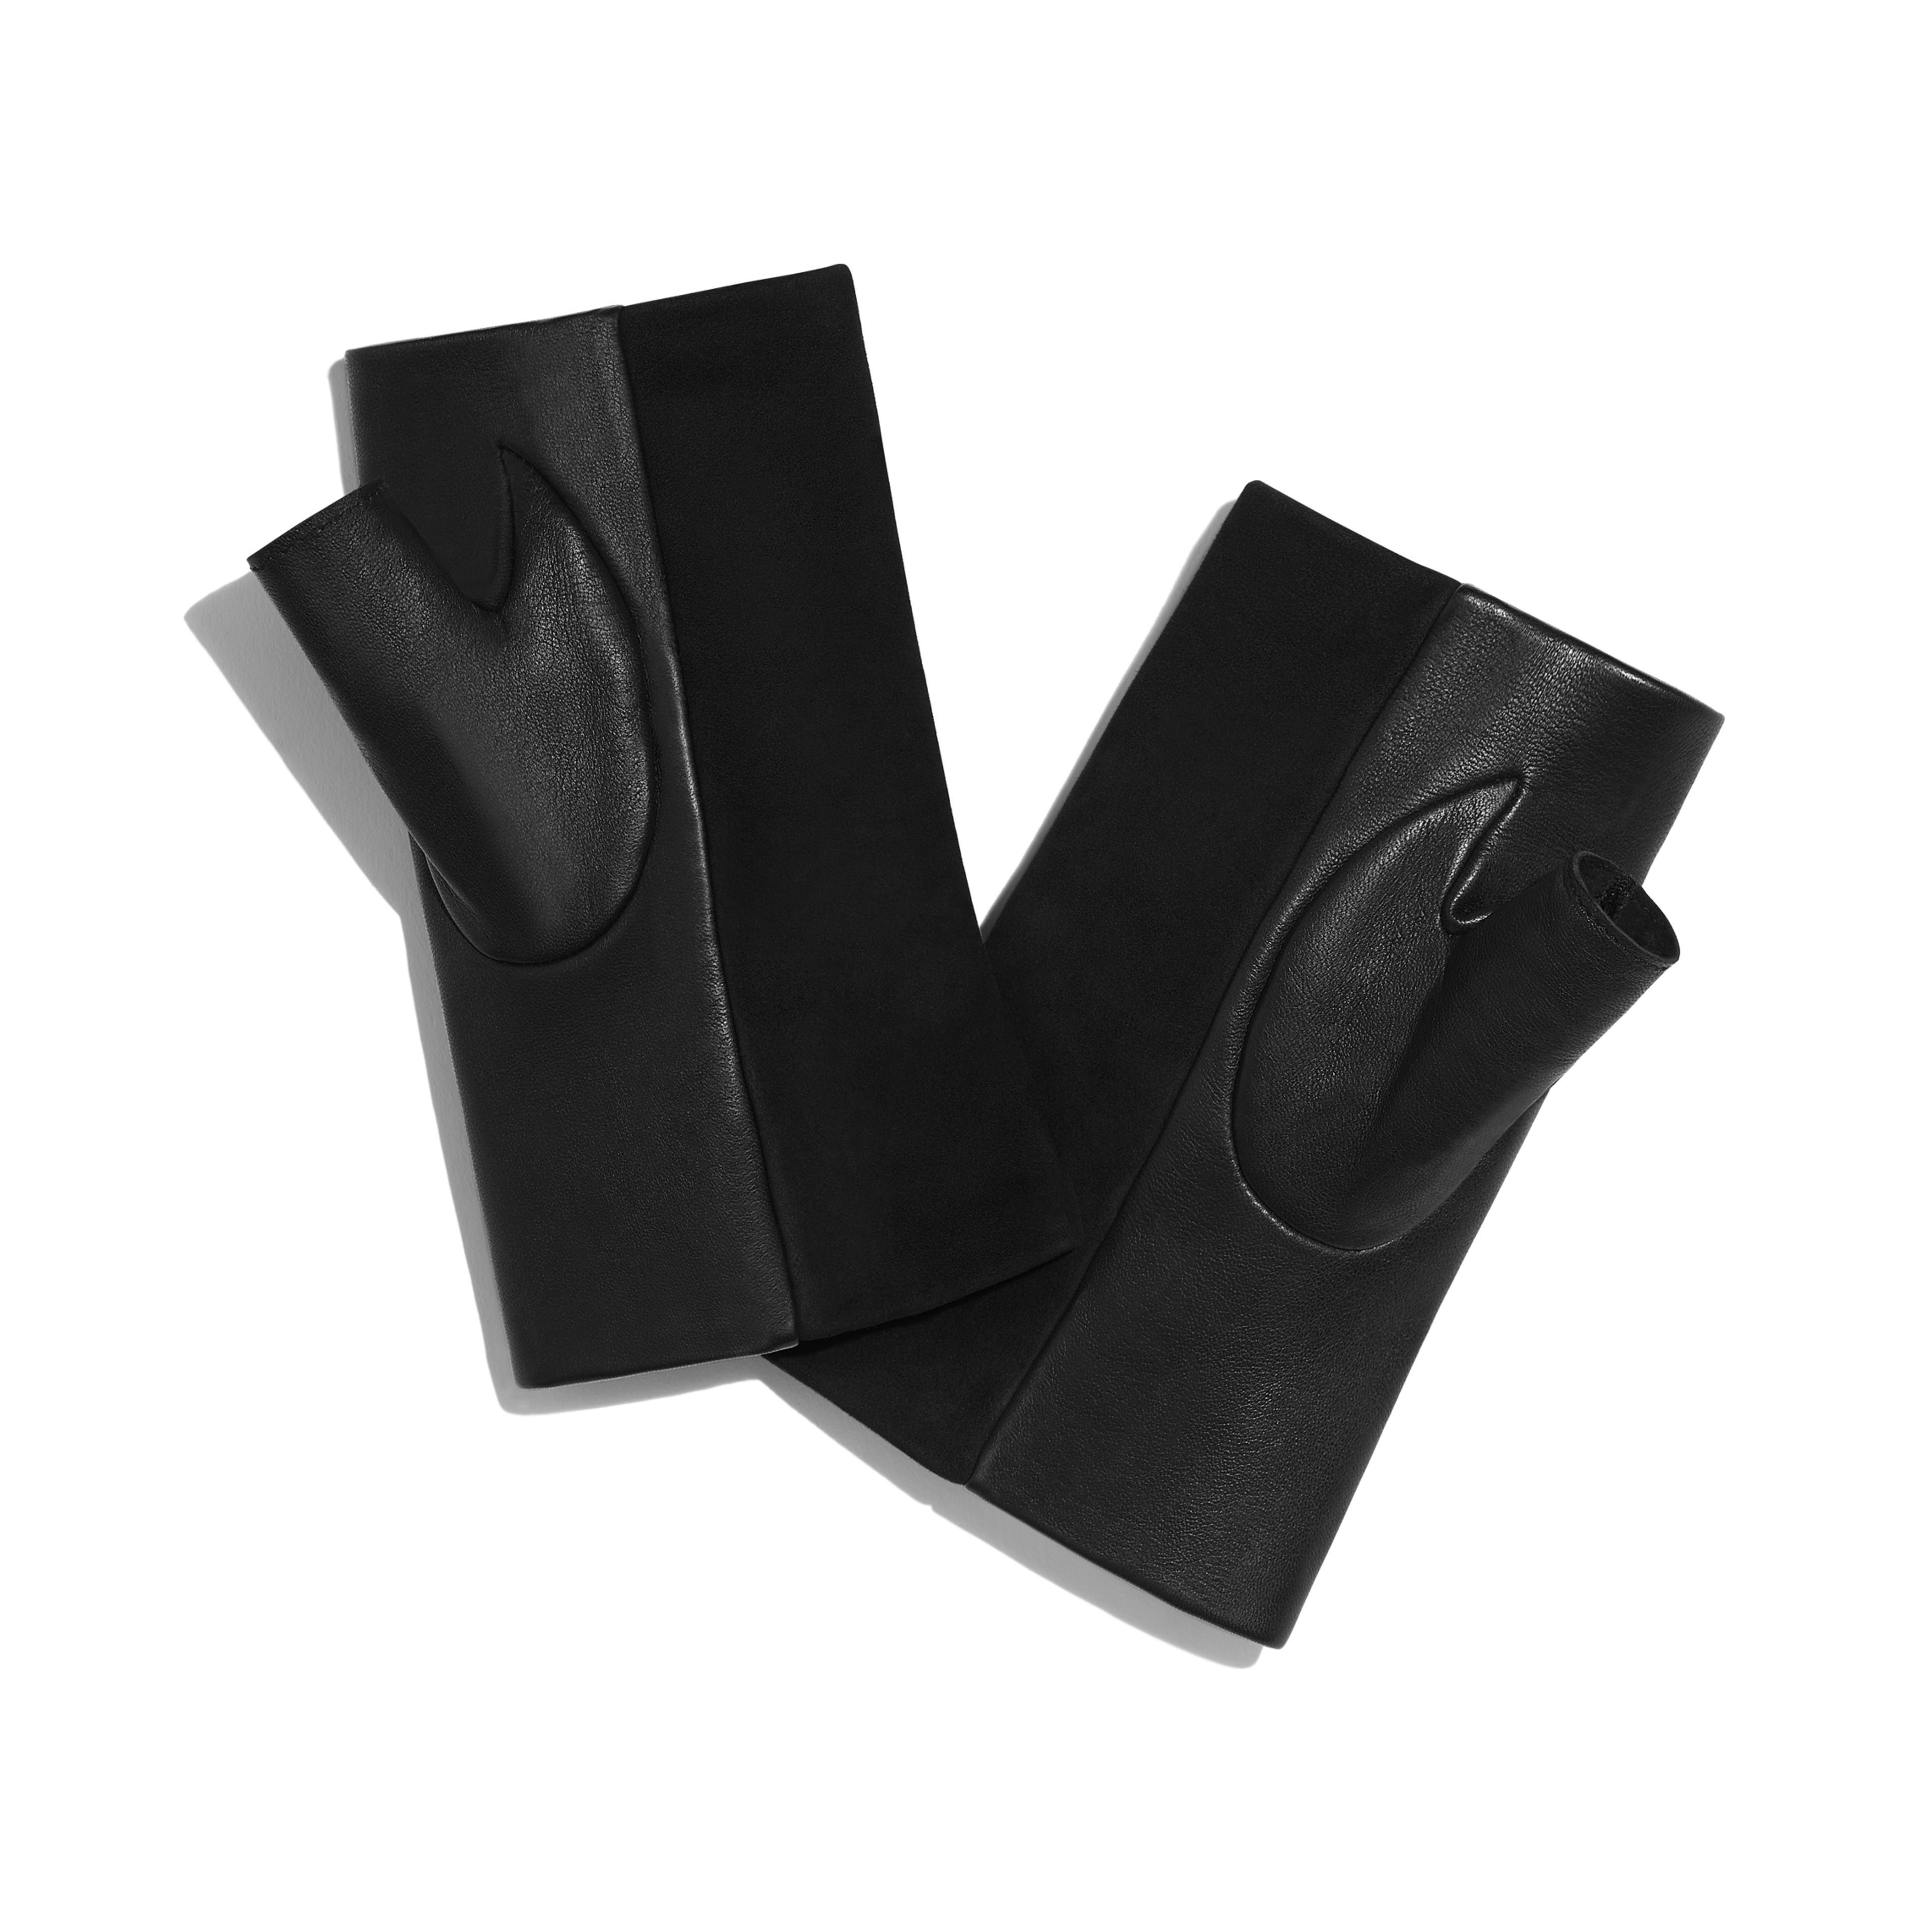 Gloves - Black - Suede Lambskin & Lambskin - Alternative view - see full sized version